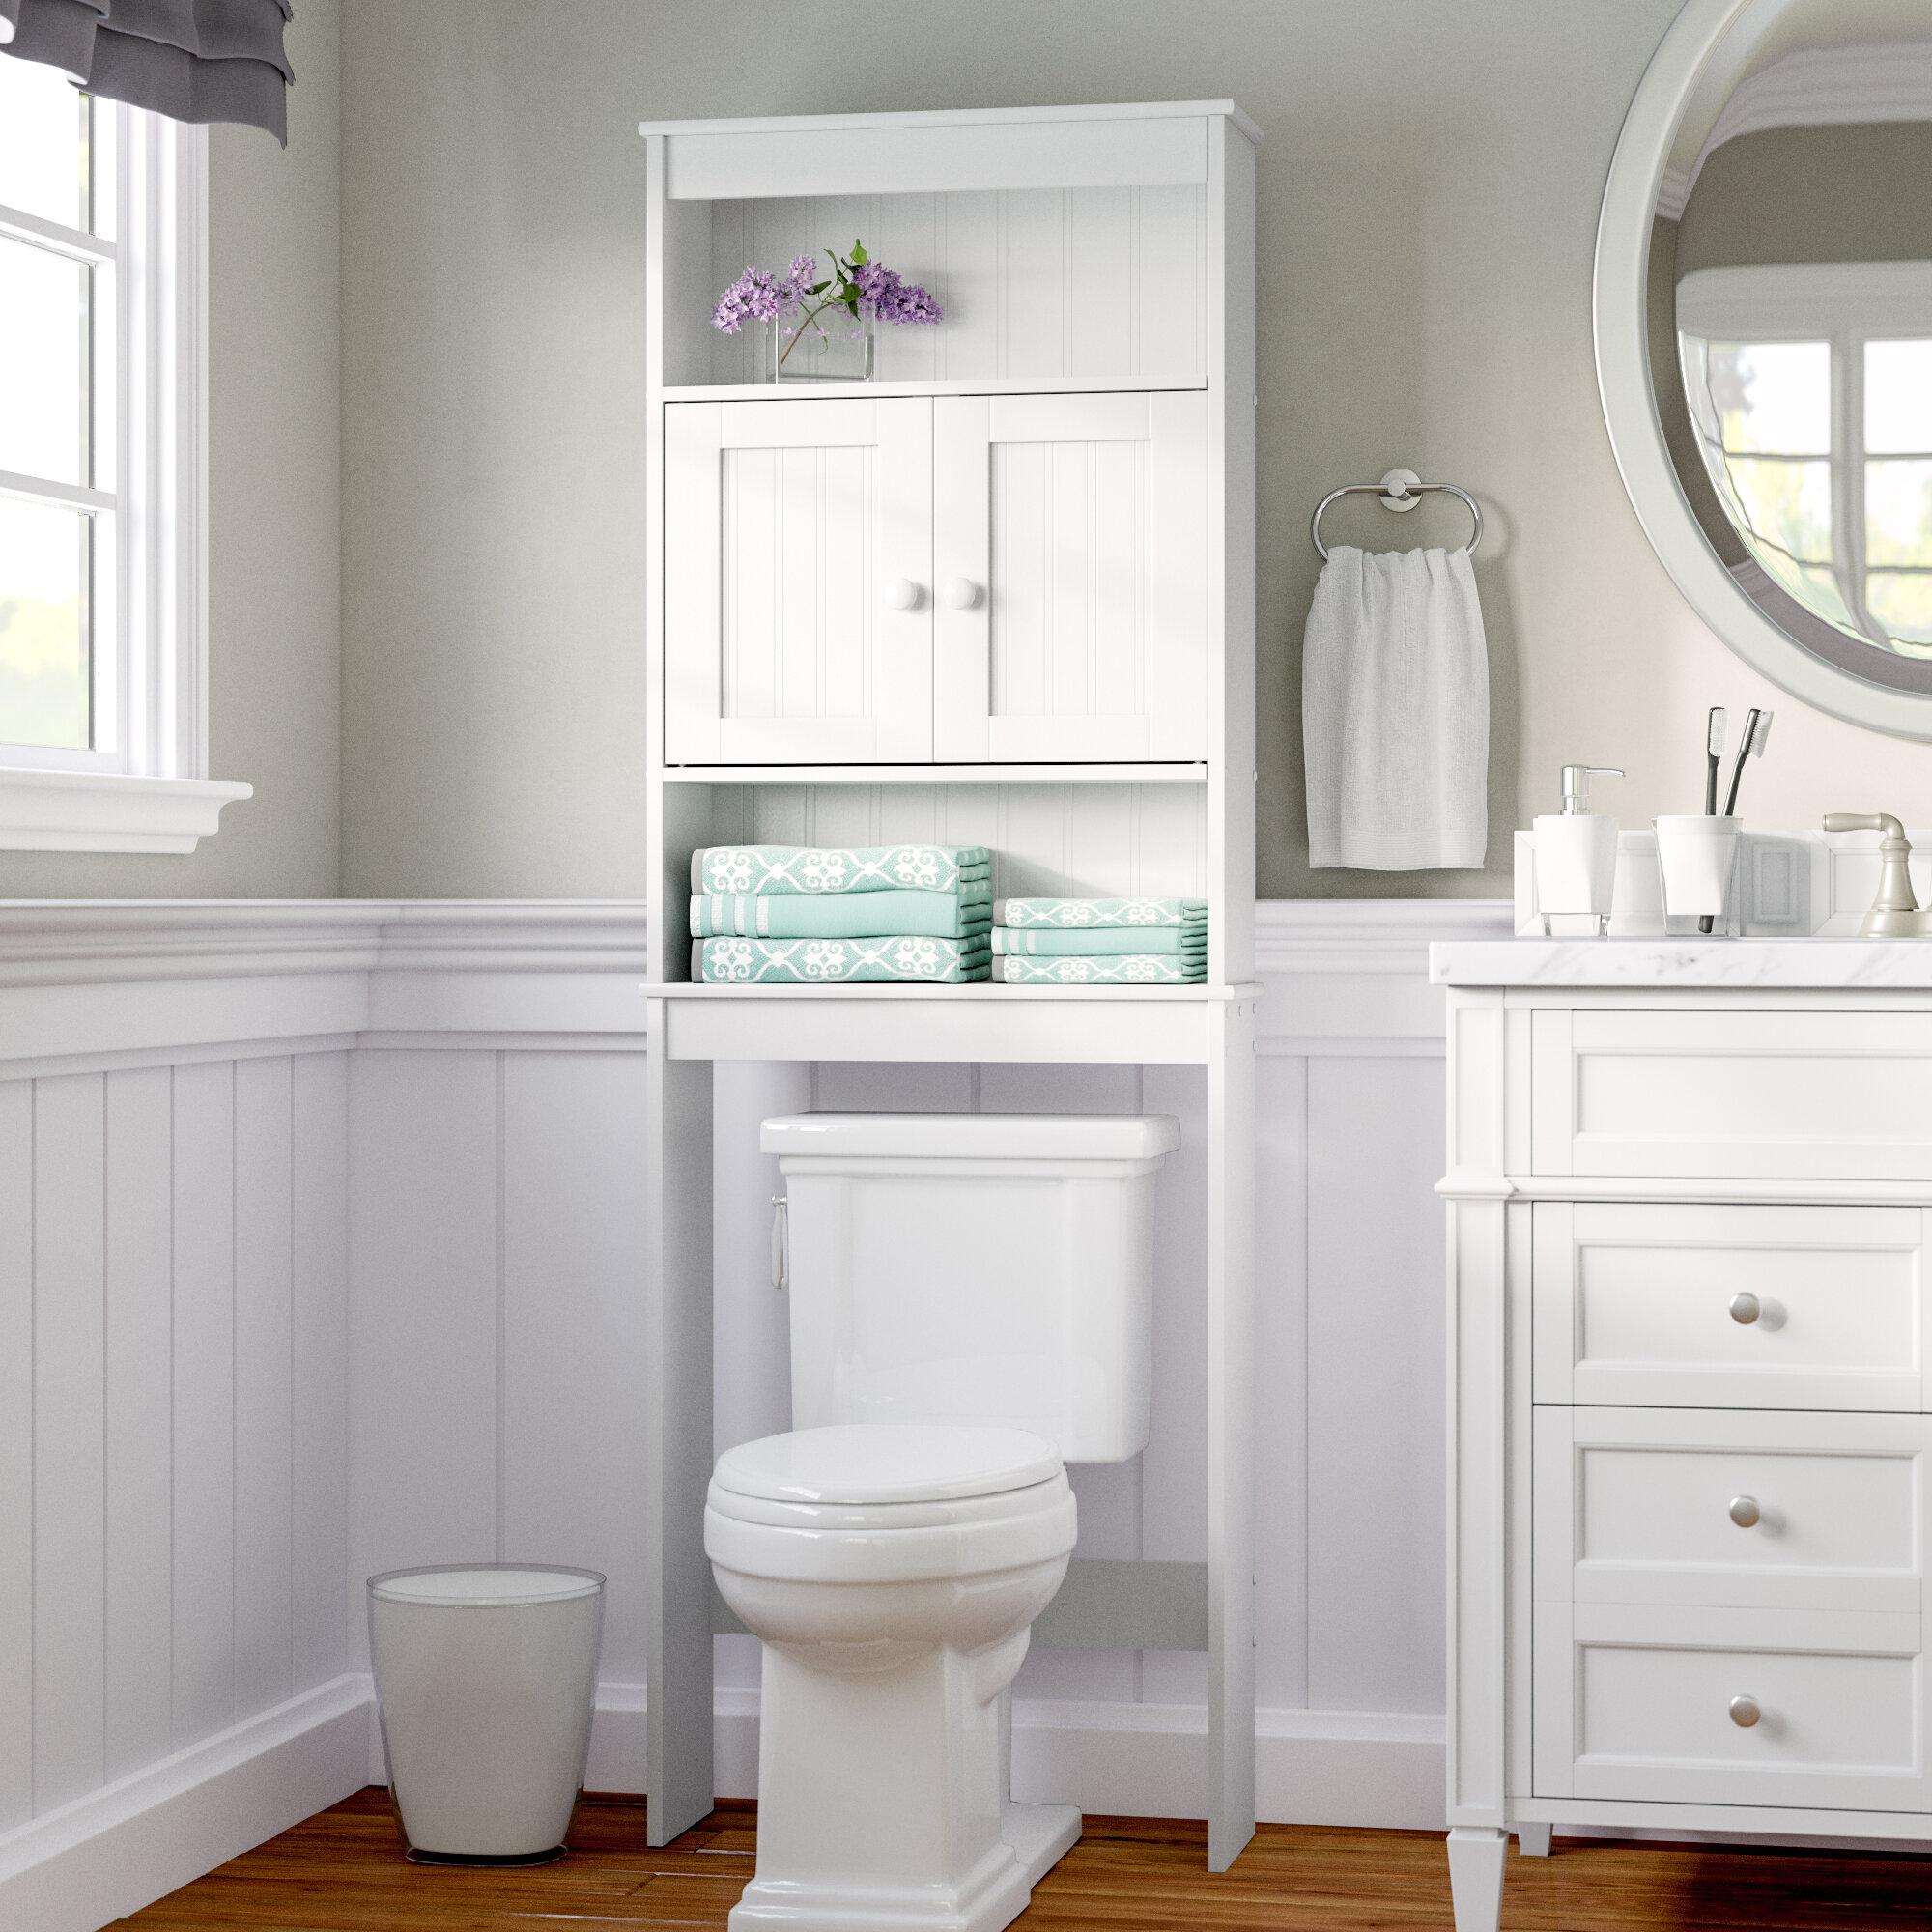 W X 66 5 H Over The Toilet Storage